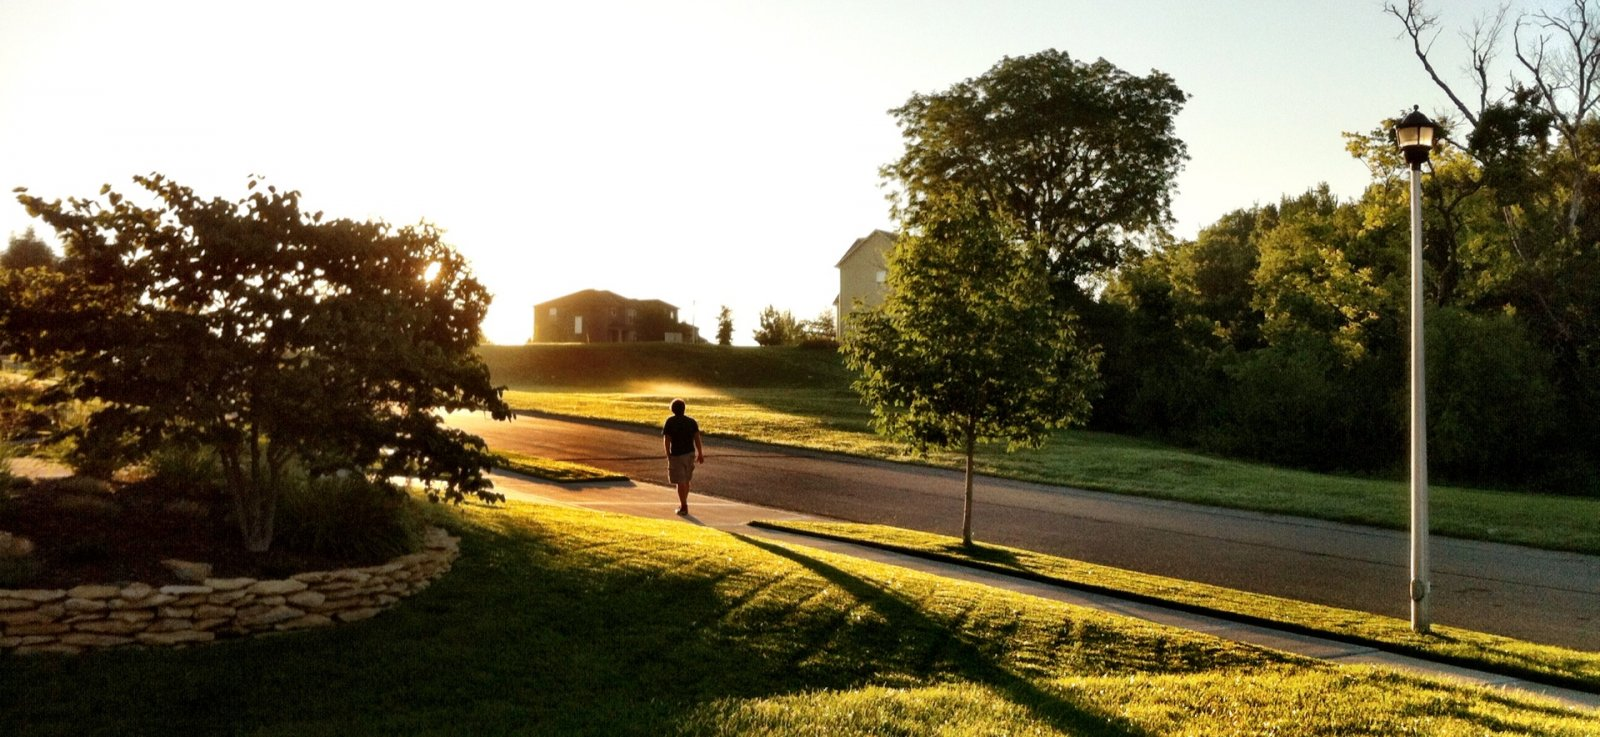 Man running in neighborhood